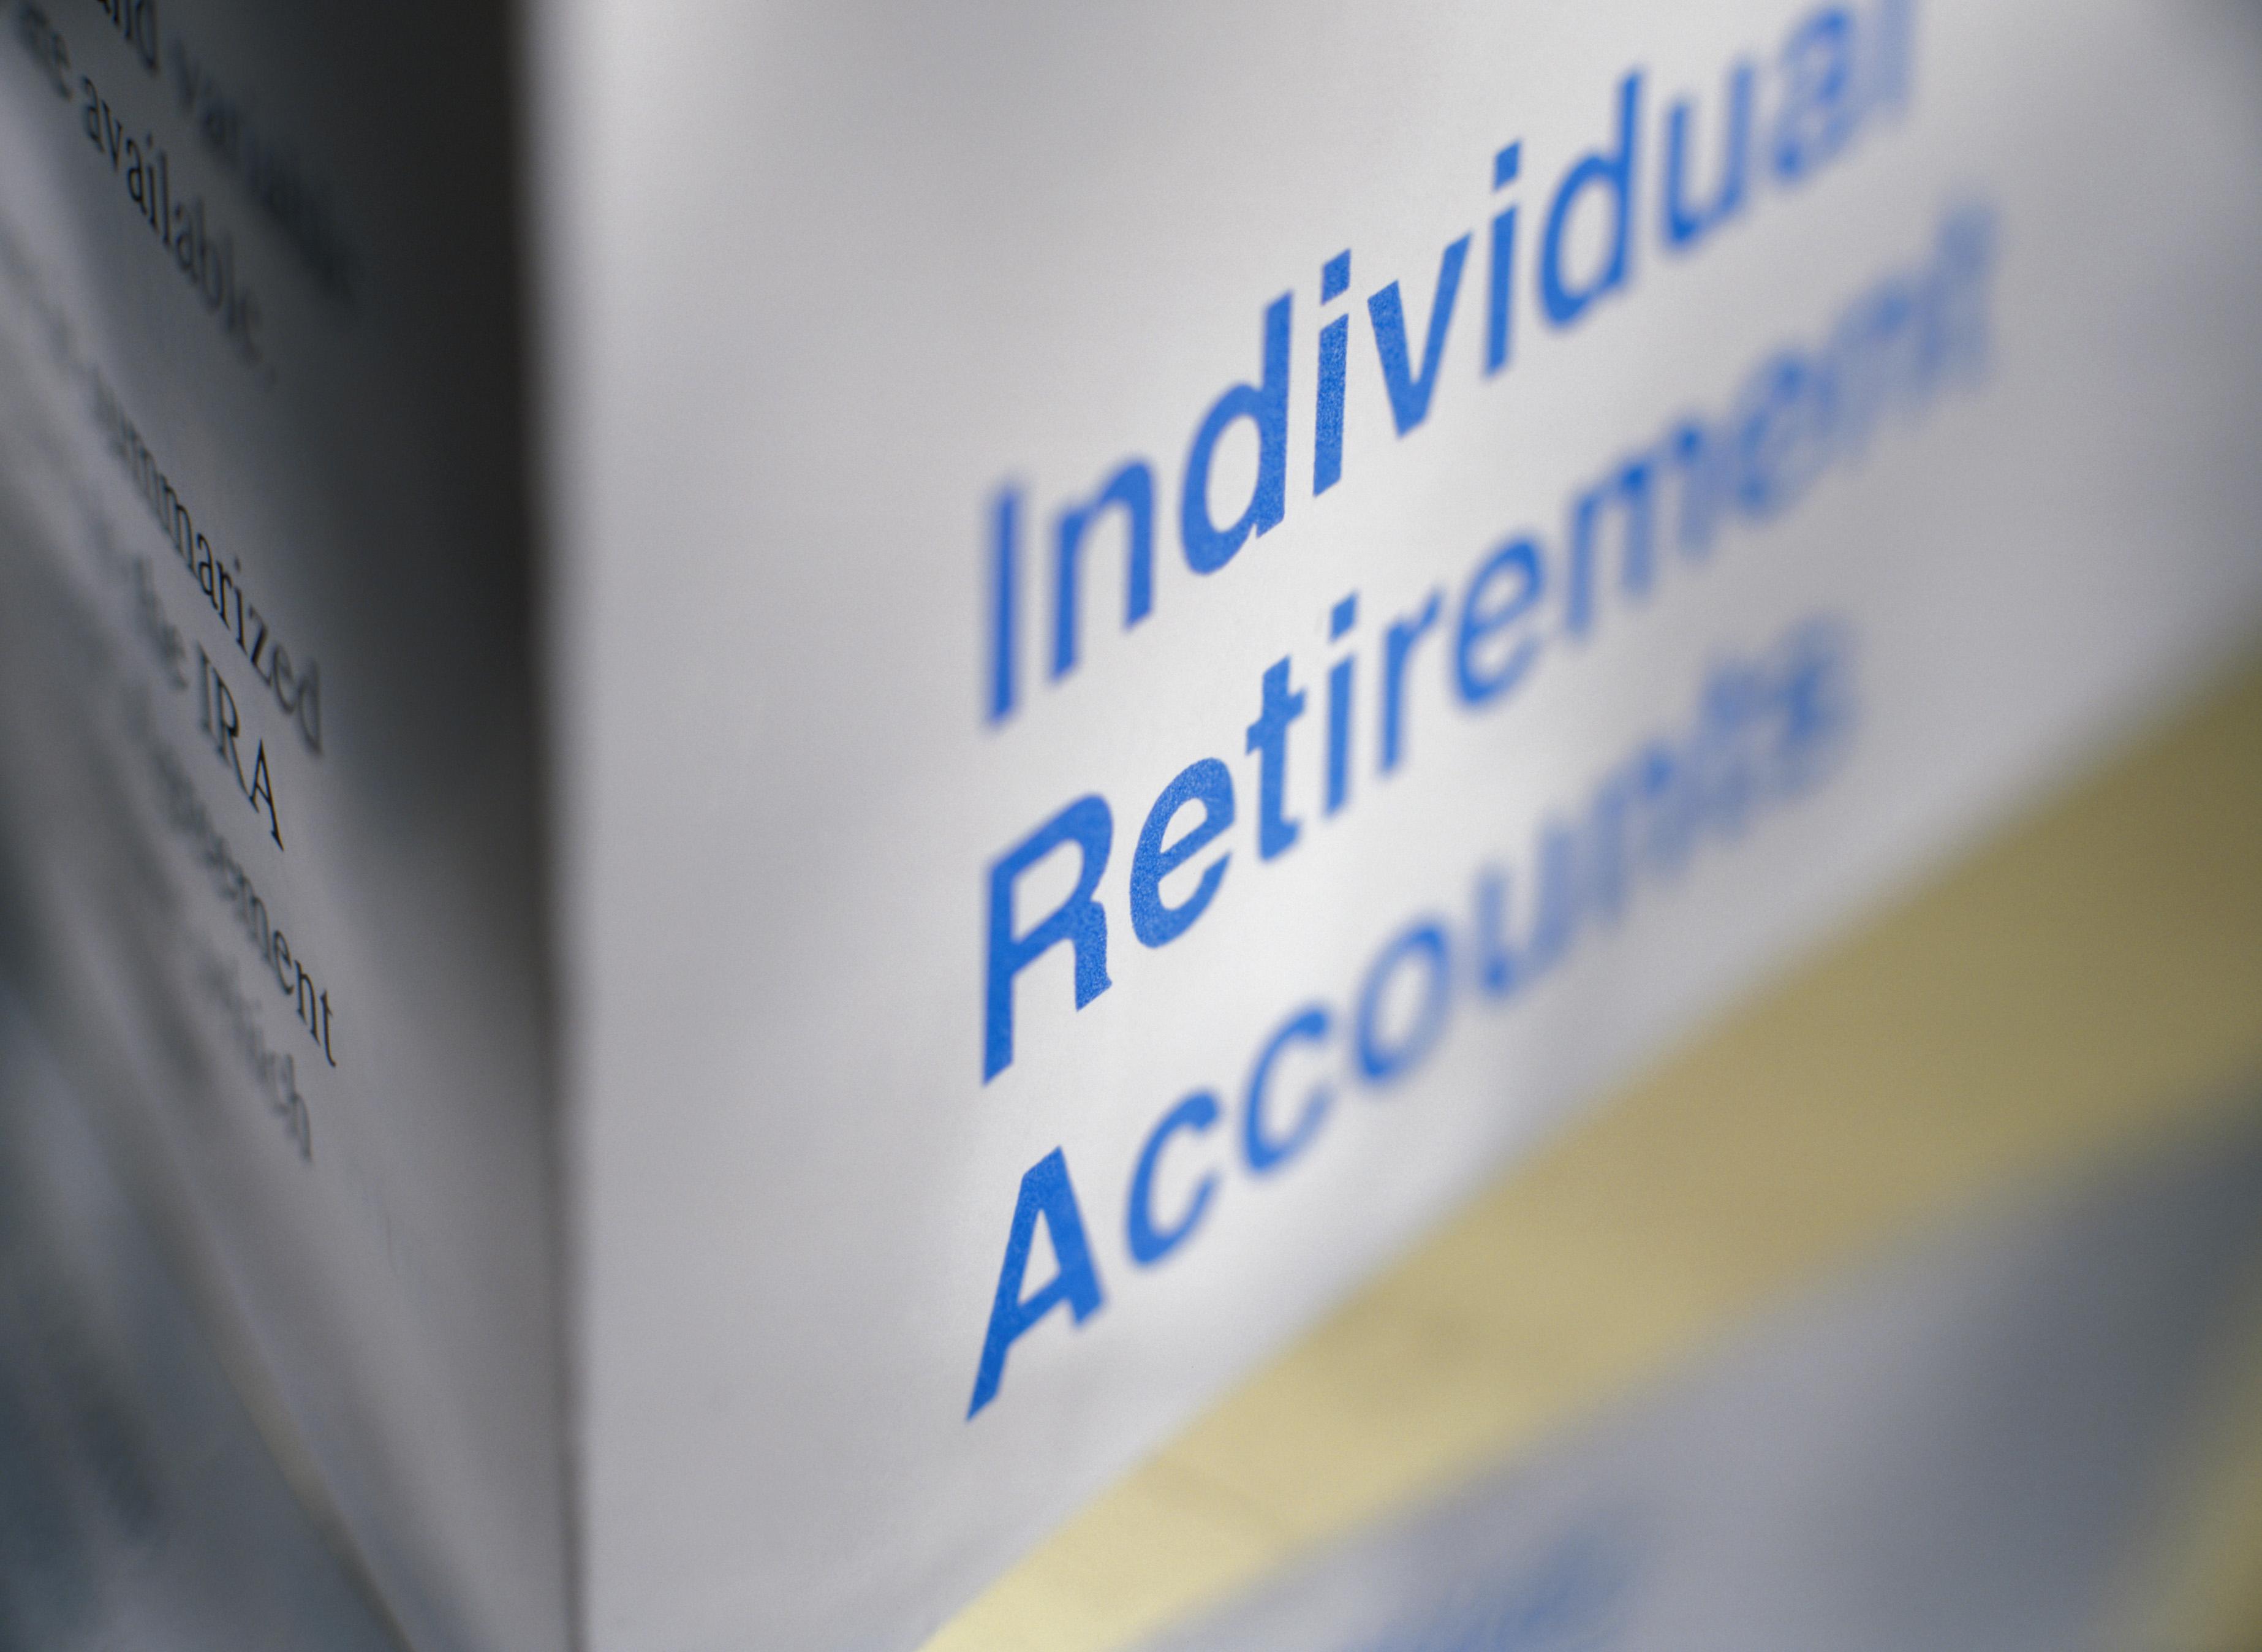 Brochure for Individual Retirement Accounts